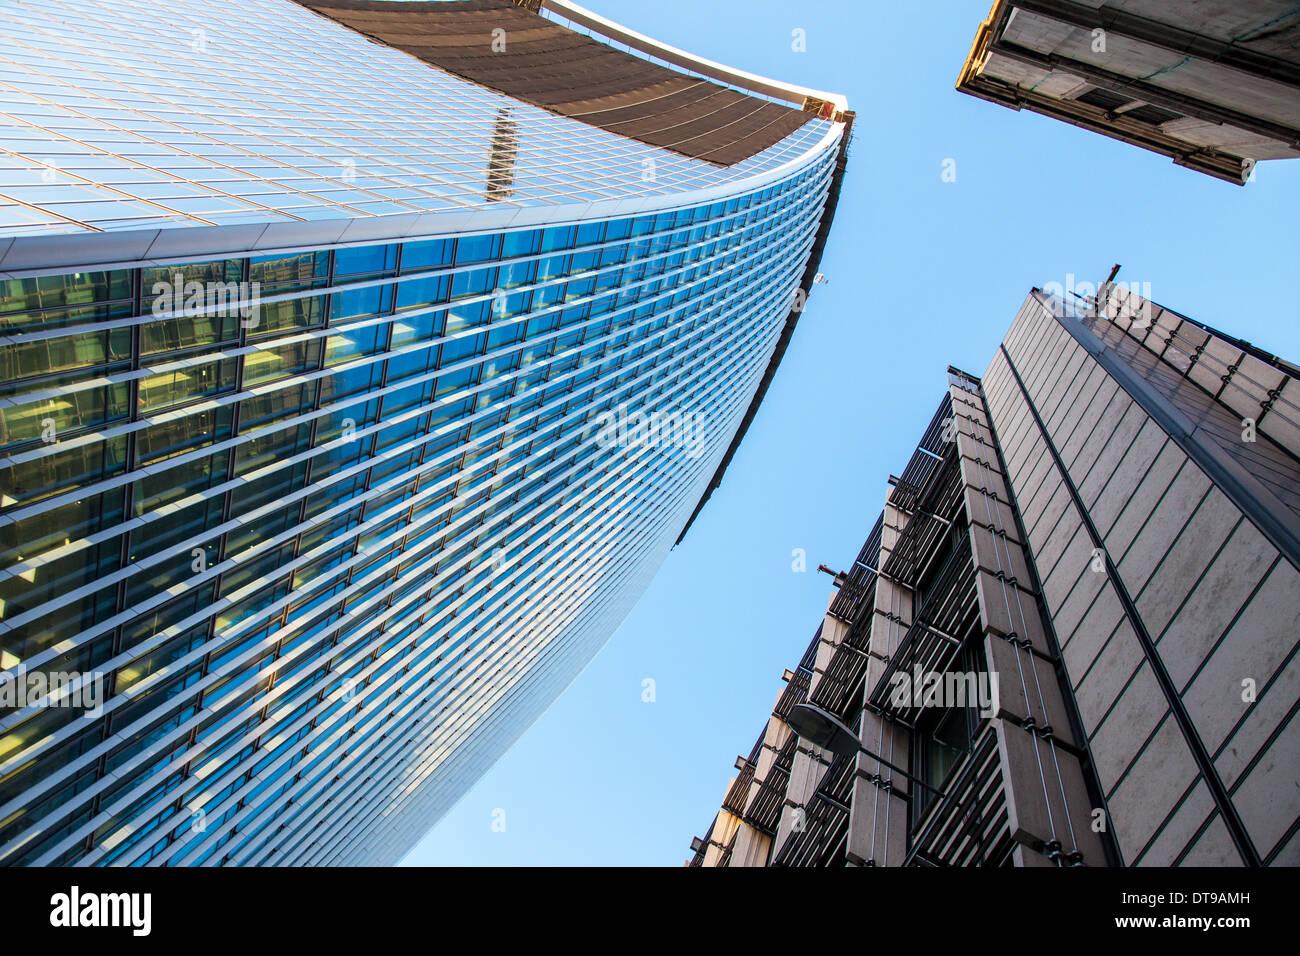 Architecture The City Of London UK - Stock Image